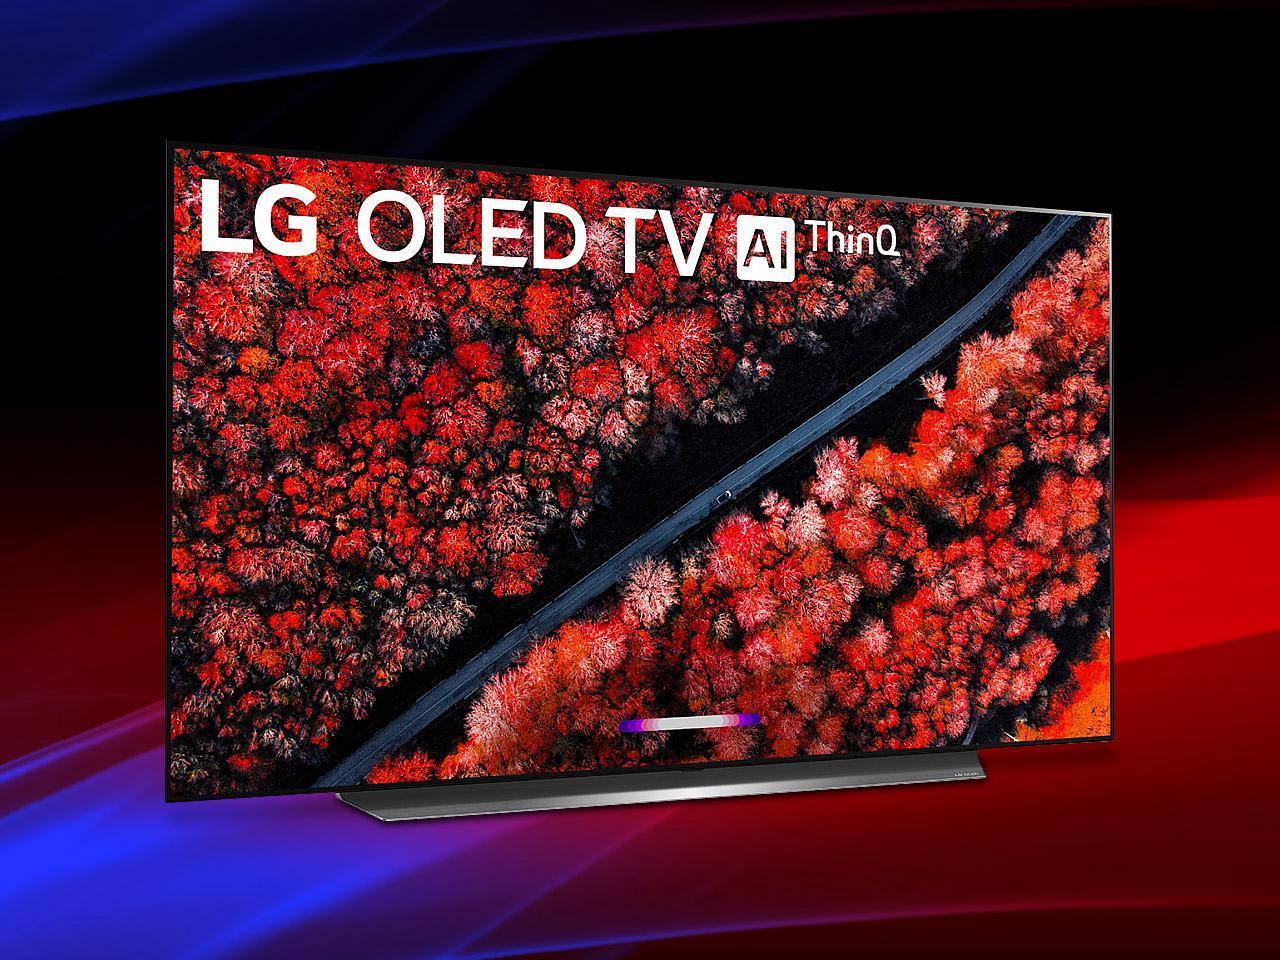 lg 2019 oled c9pua 65 inch tv $2499 - Page 4 - Slickdeals net